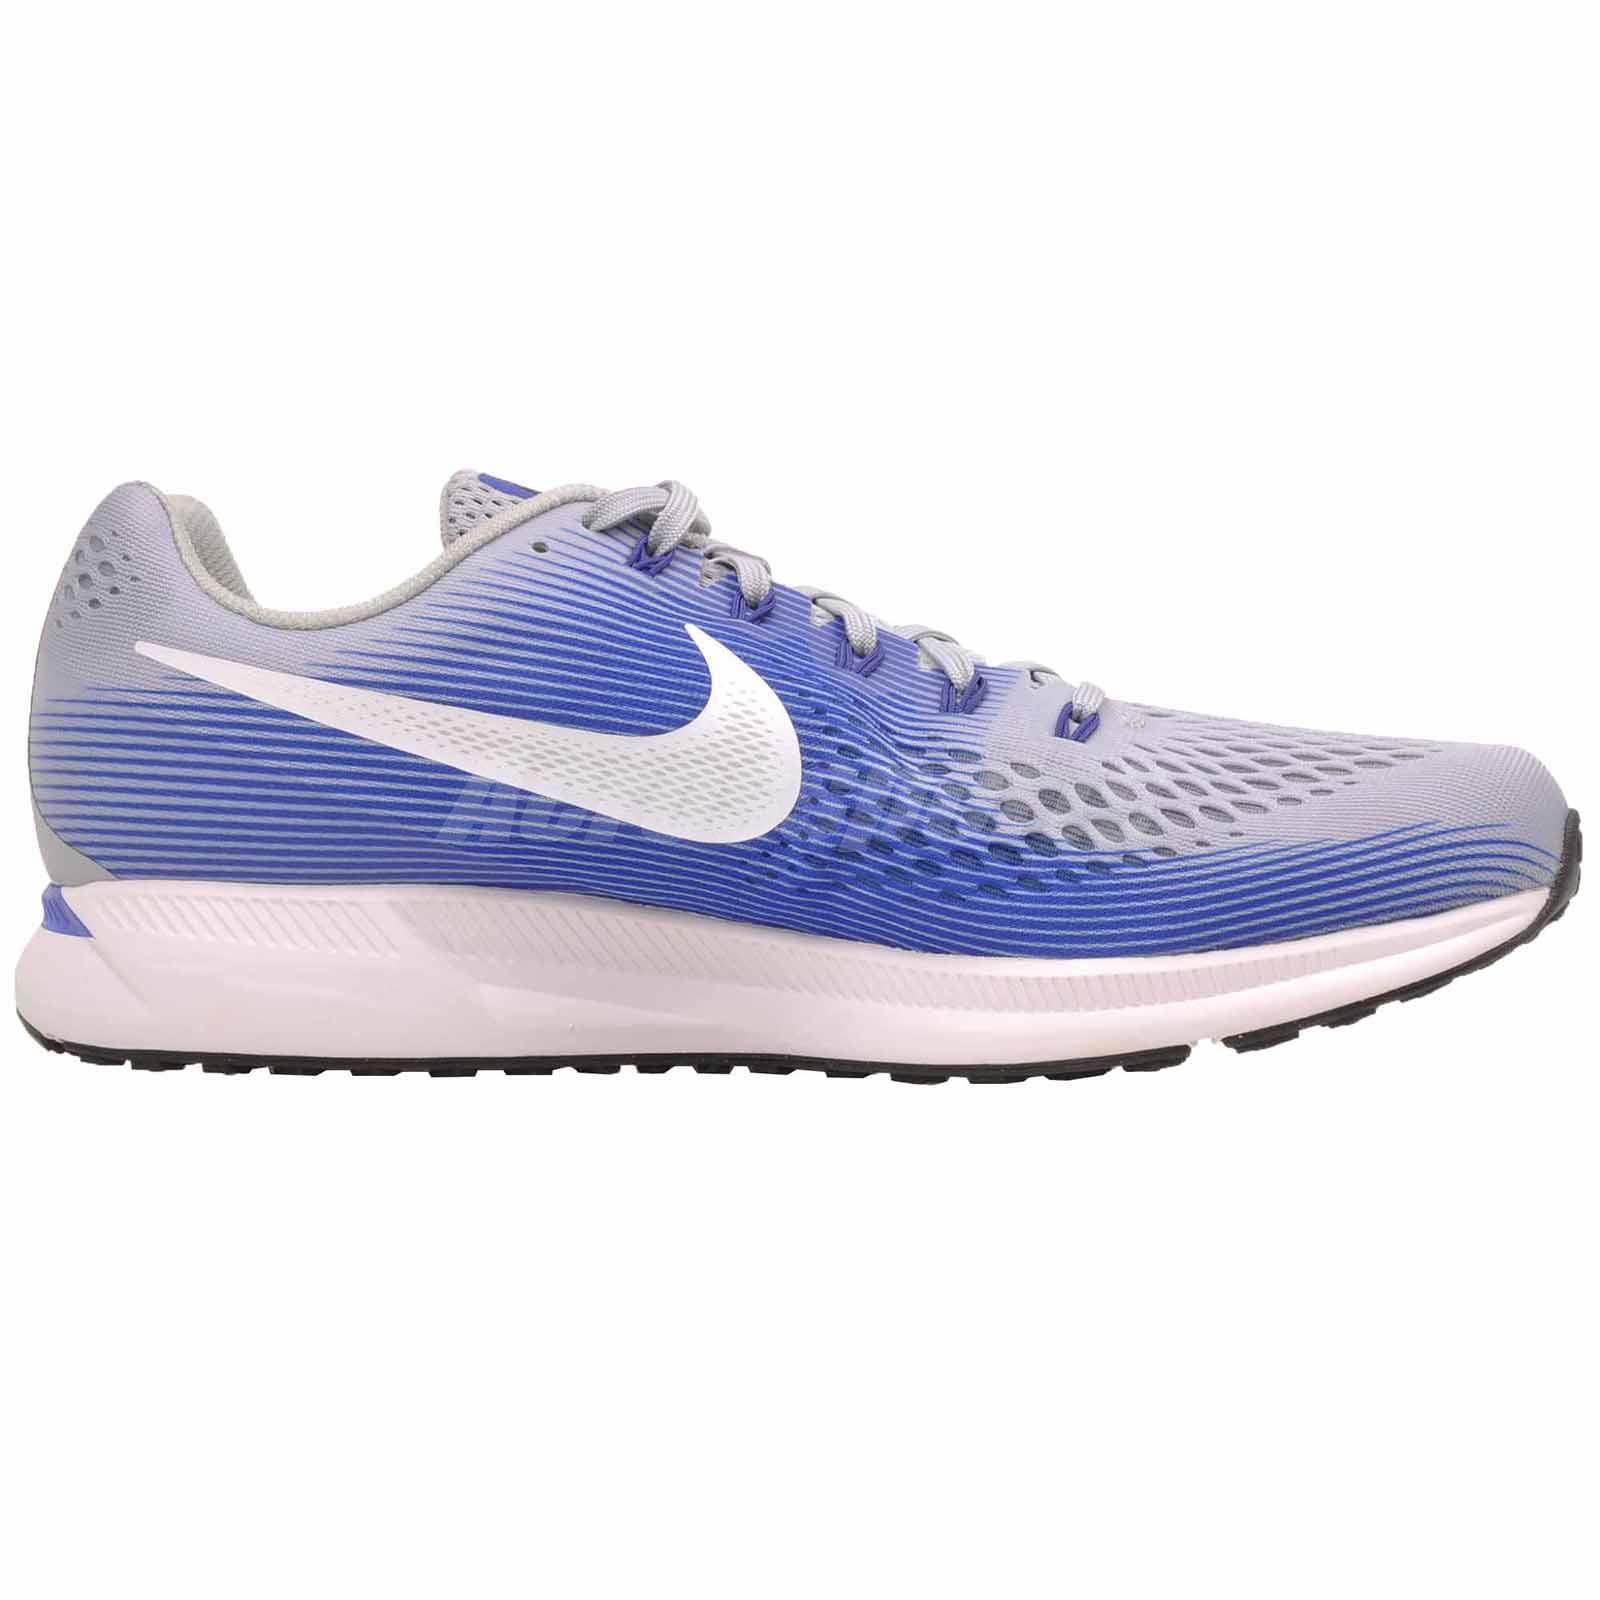 609ba1c7f2 Nike Air Zoom Pegasus 34 (4E) Running Shoes Mens Wide Grey Blue ...